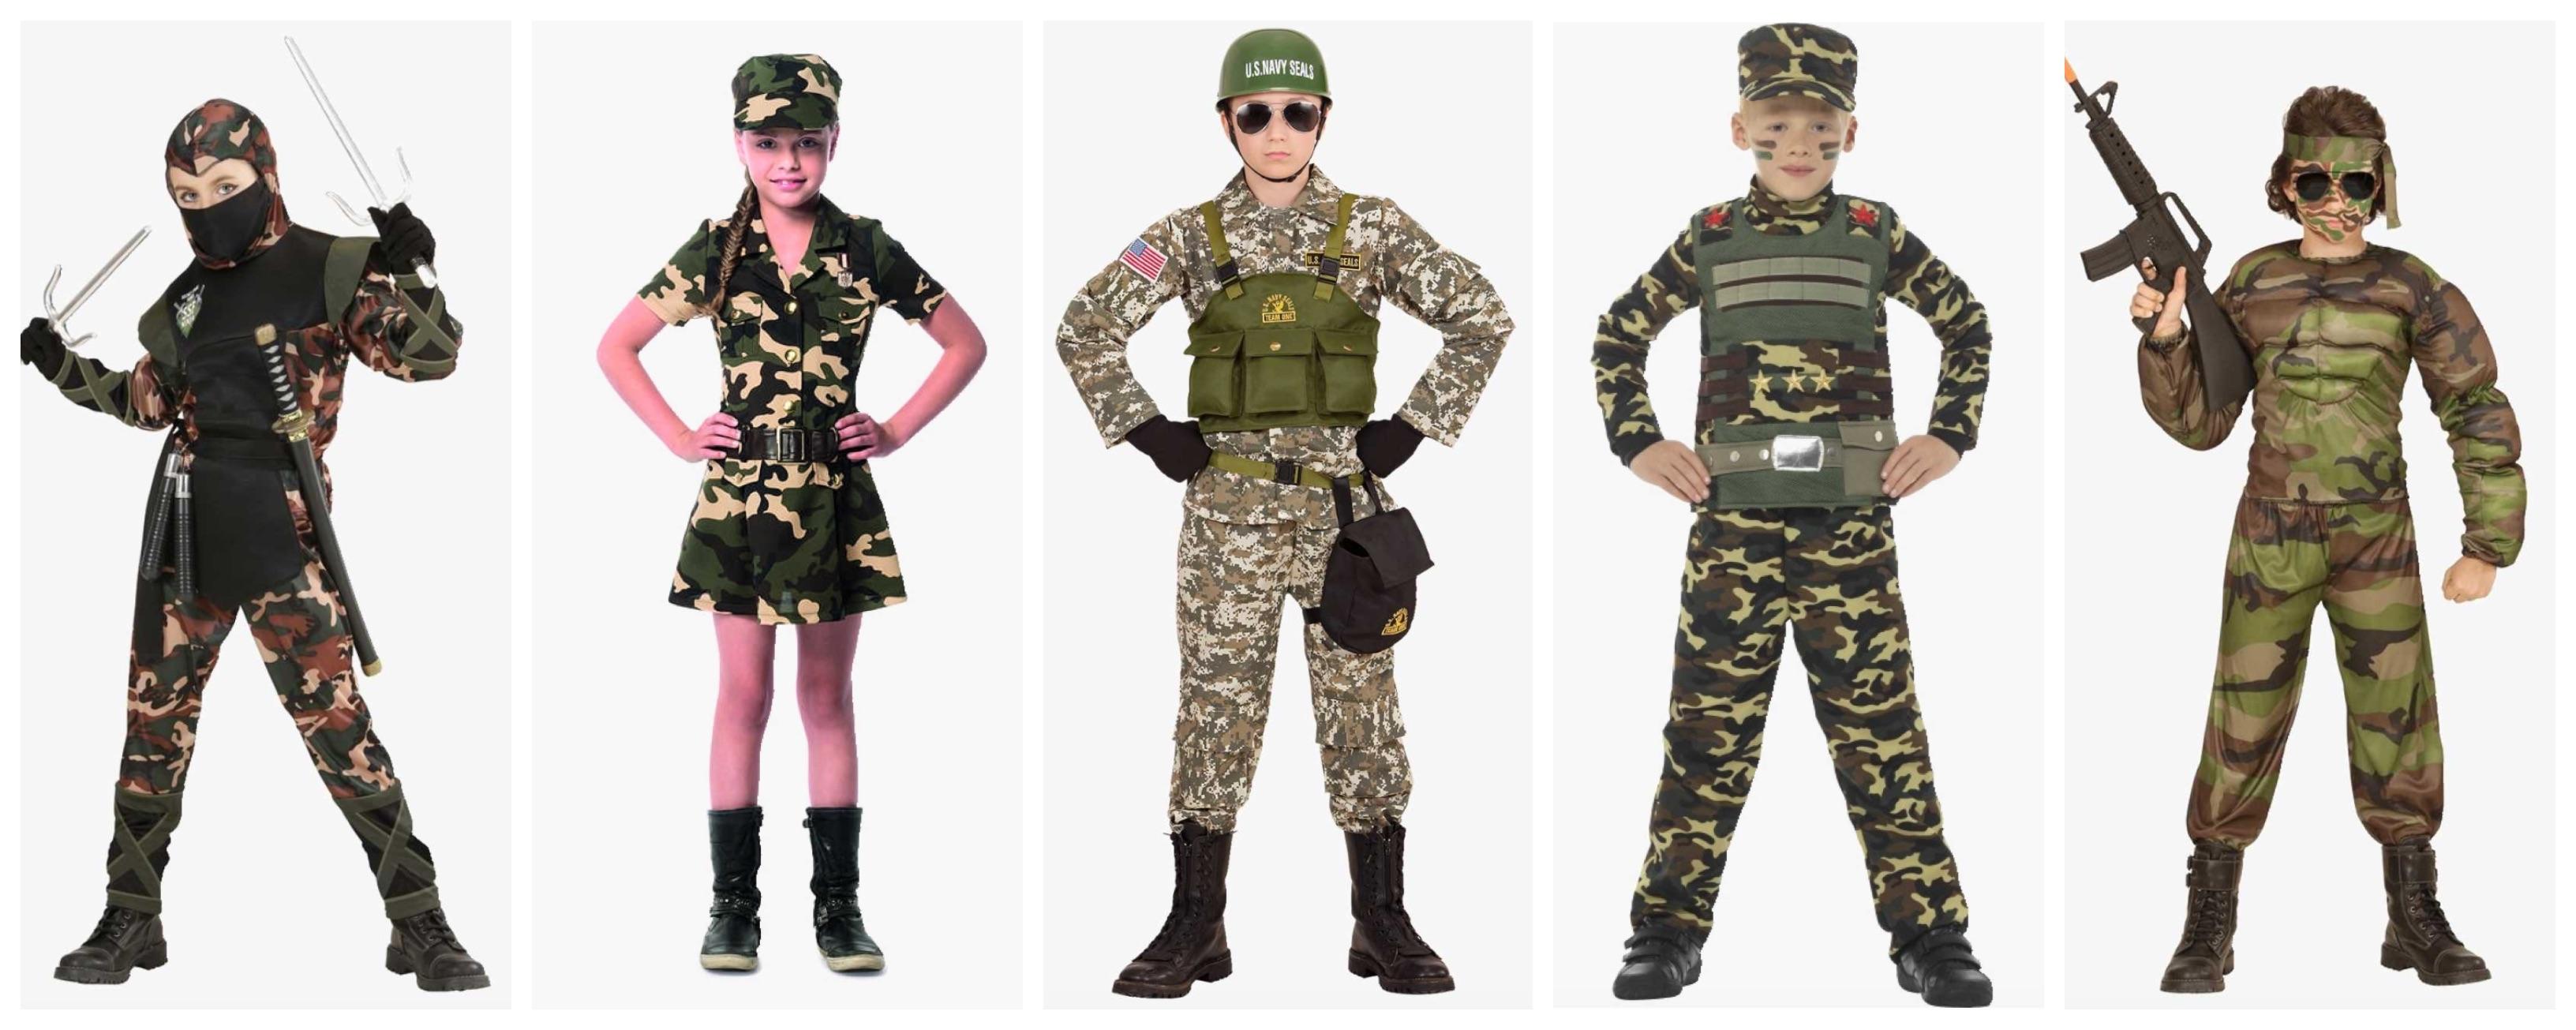 soldat kostume til børn 1 - Soldat kostume til børn